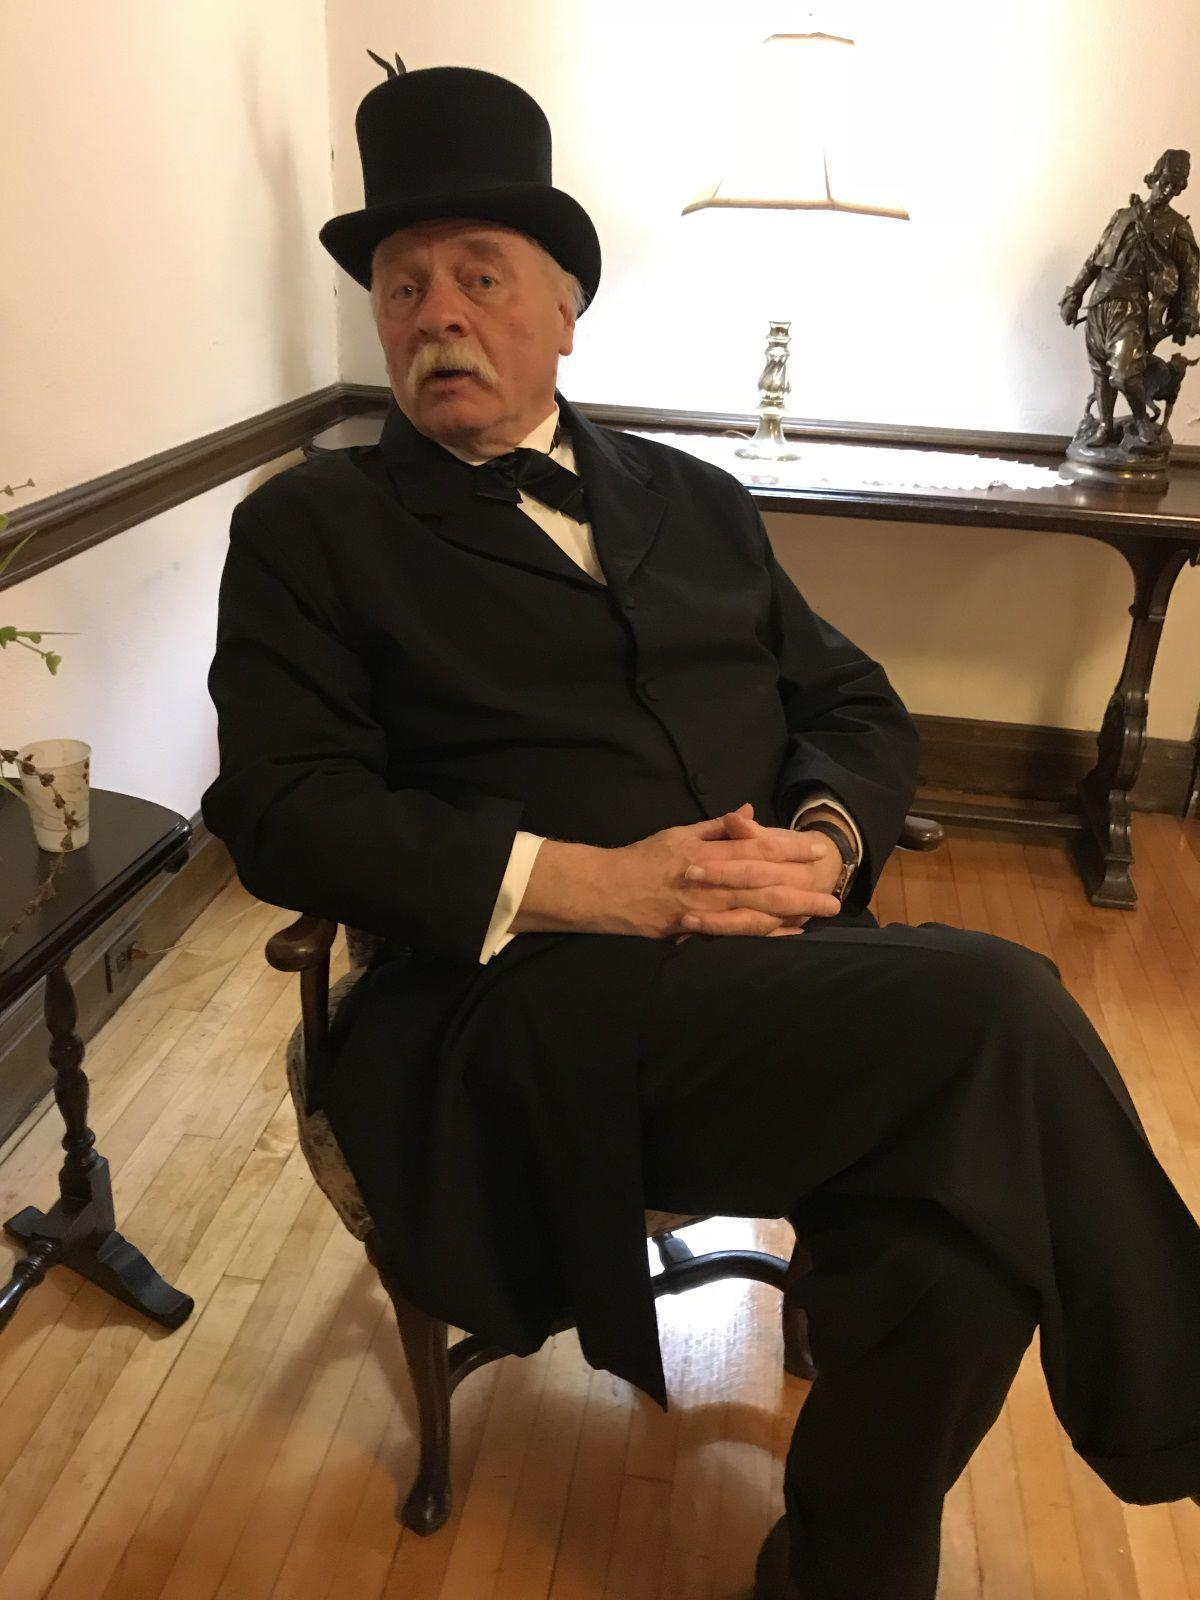 (VIDEO) President's grandson tries to stir interest in history